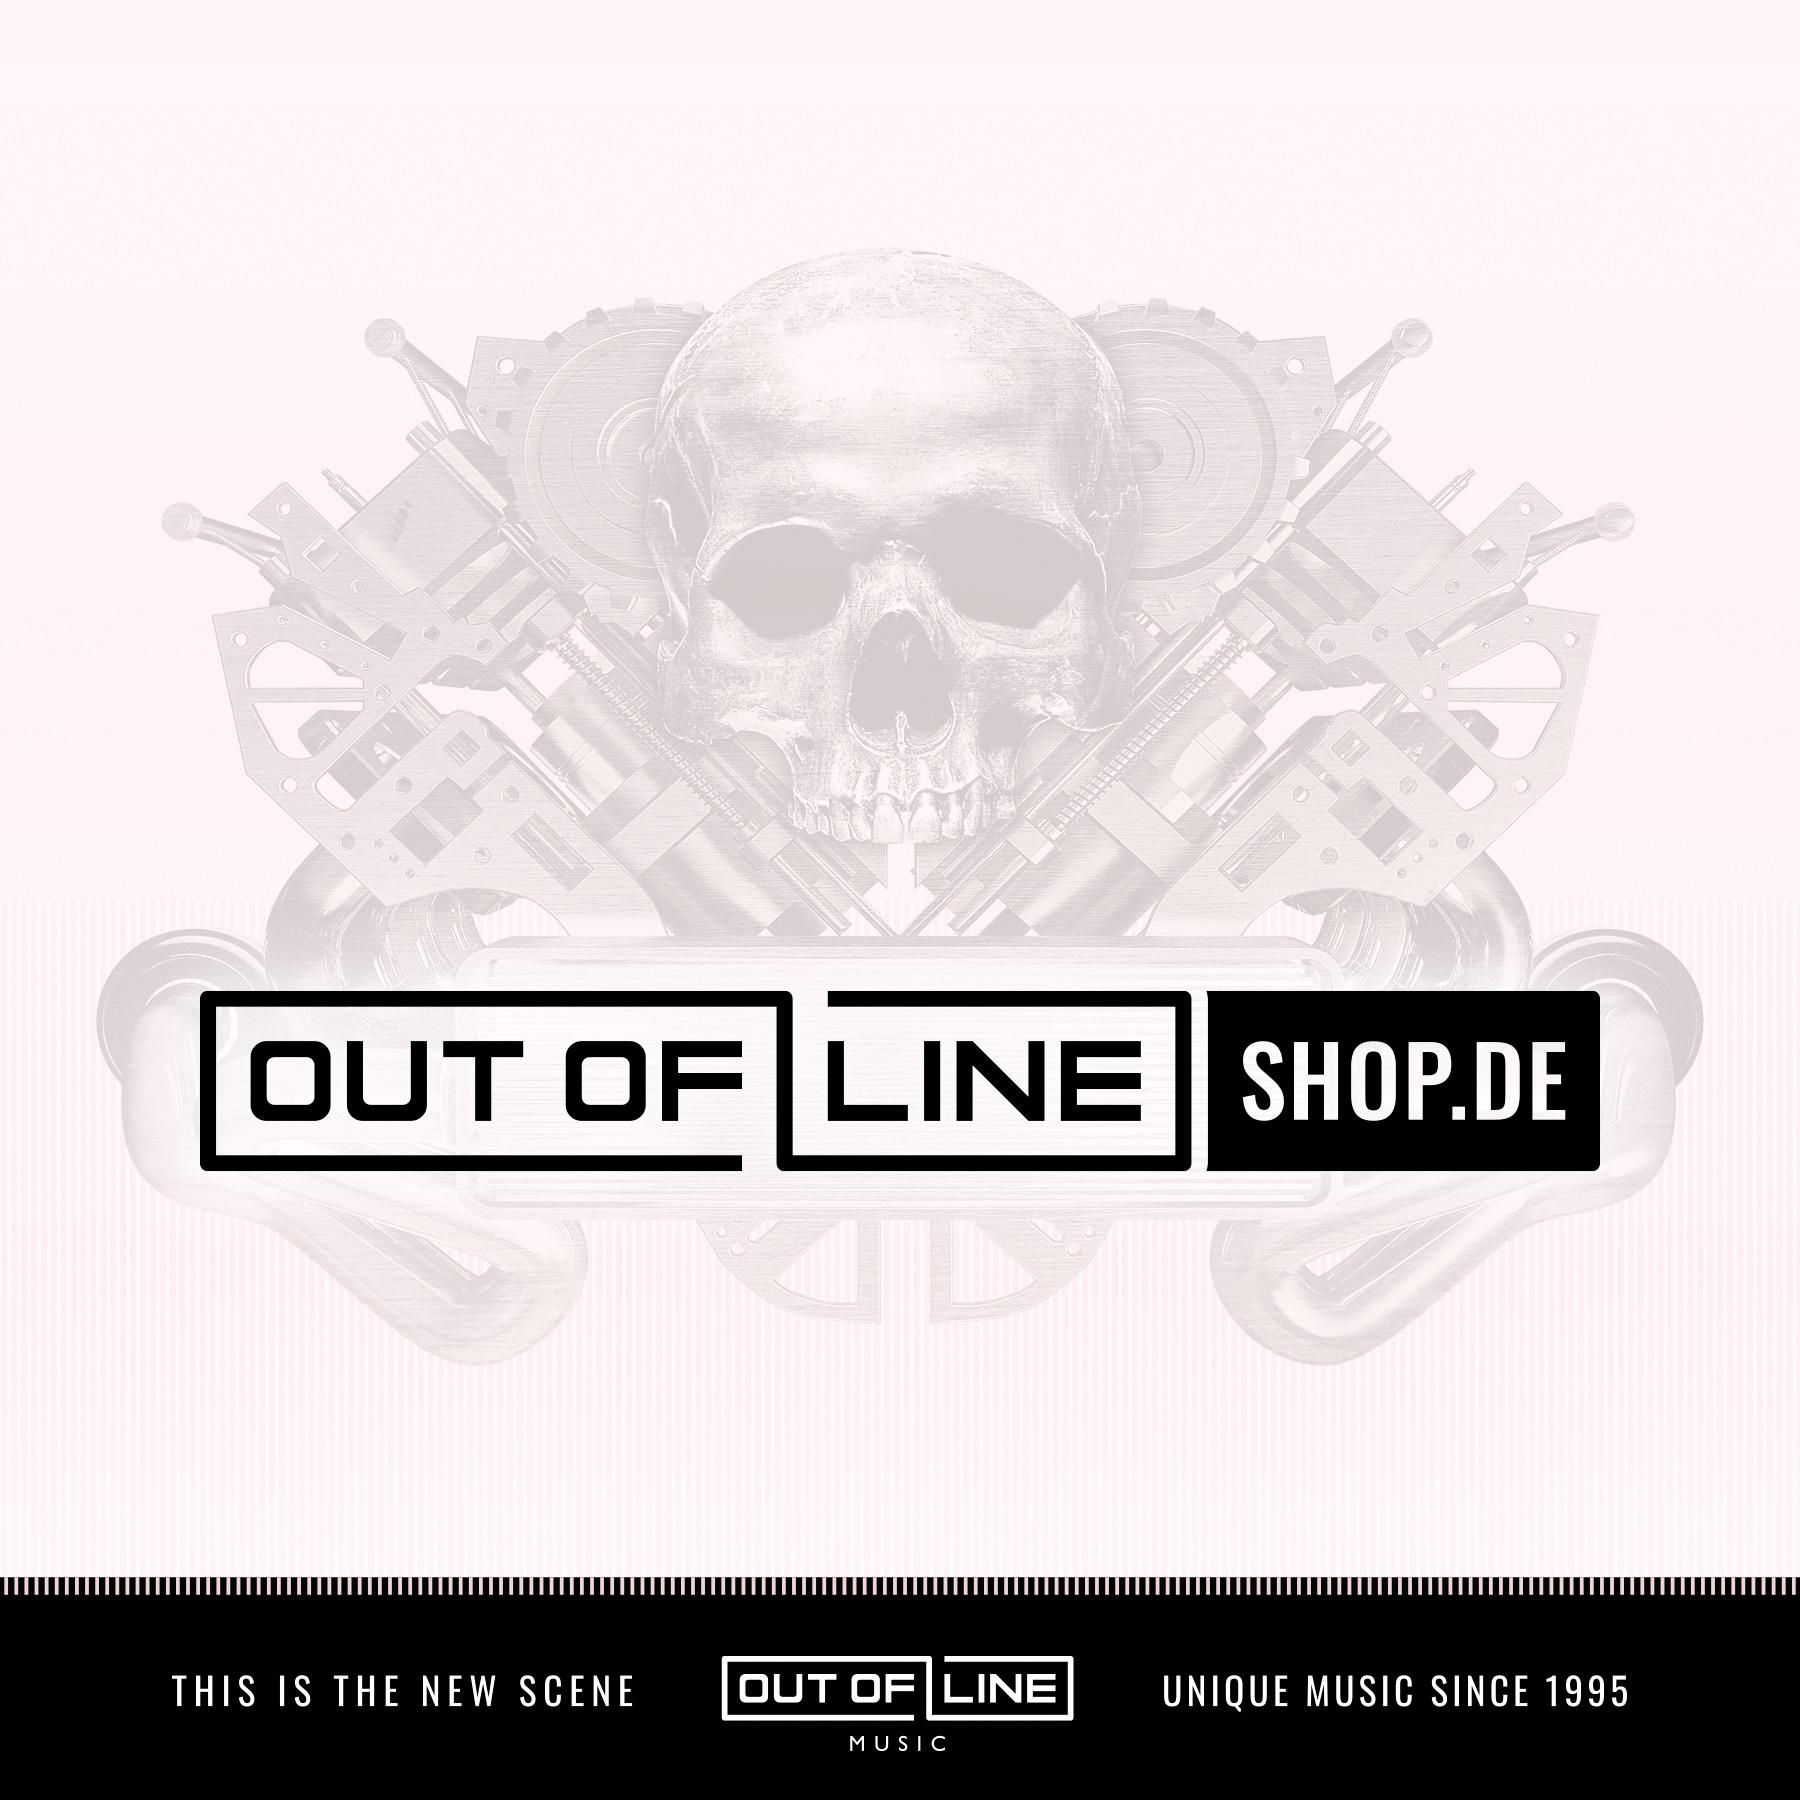 Public Image Limited - Album (Ltd.Edt.Super Deluxe Box) - 4CD